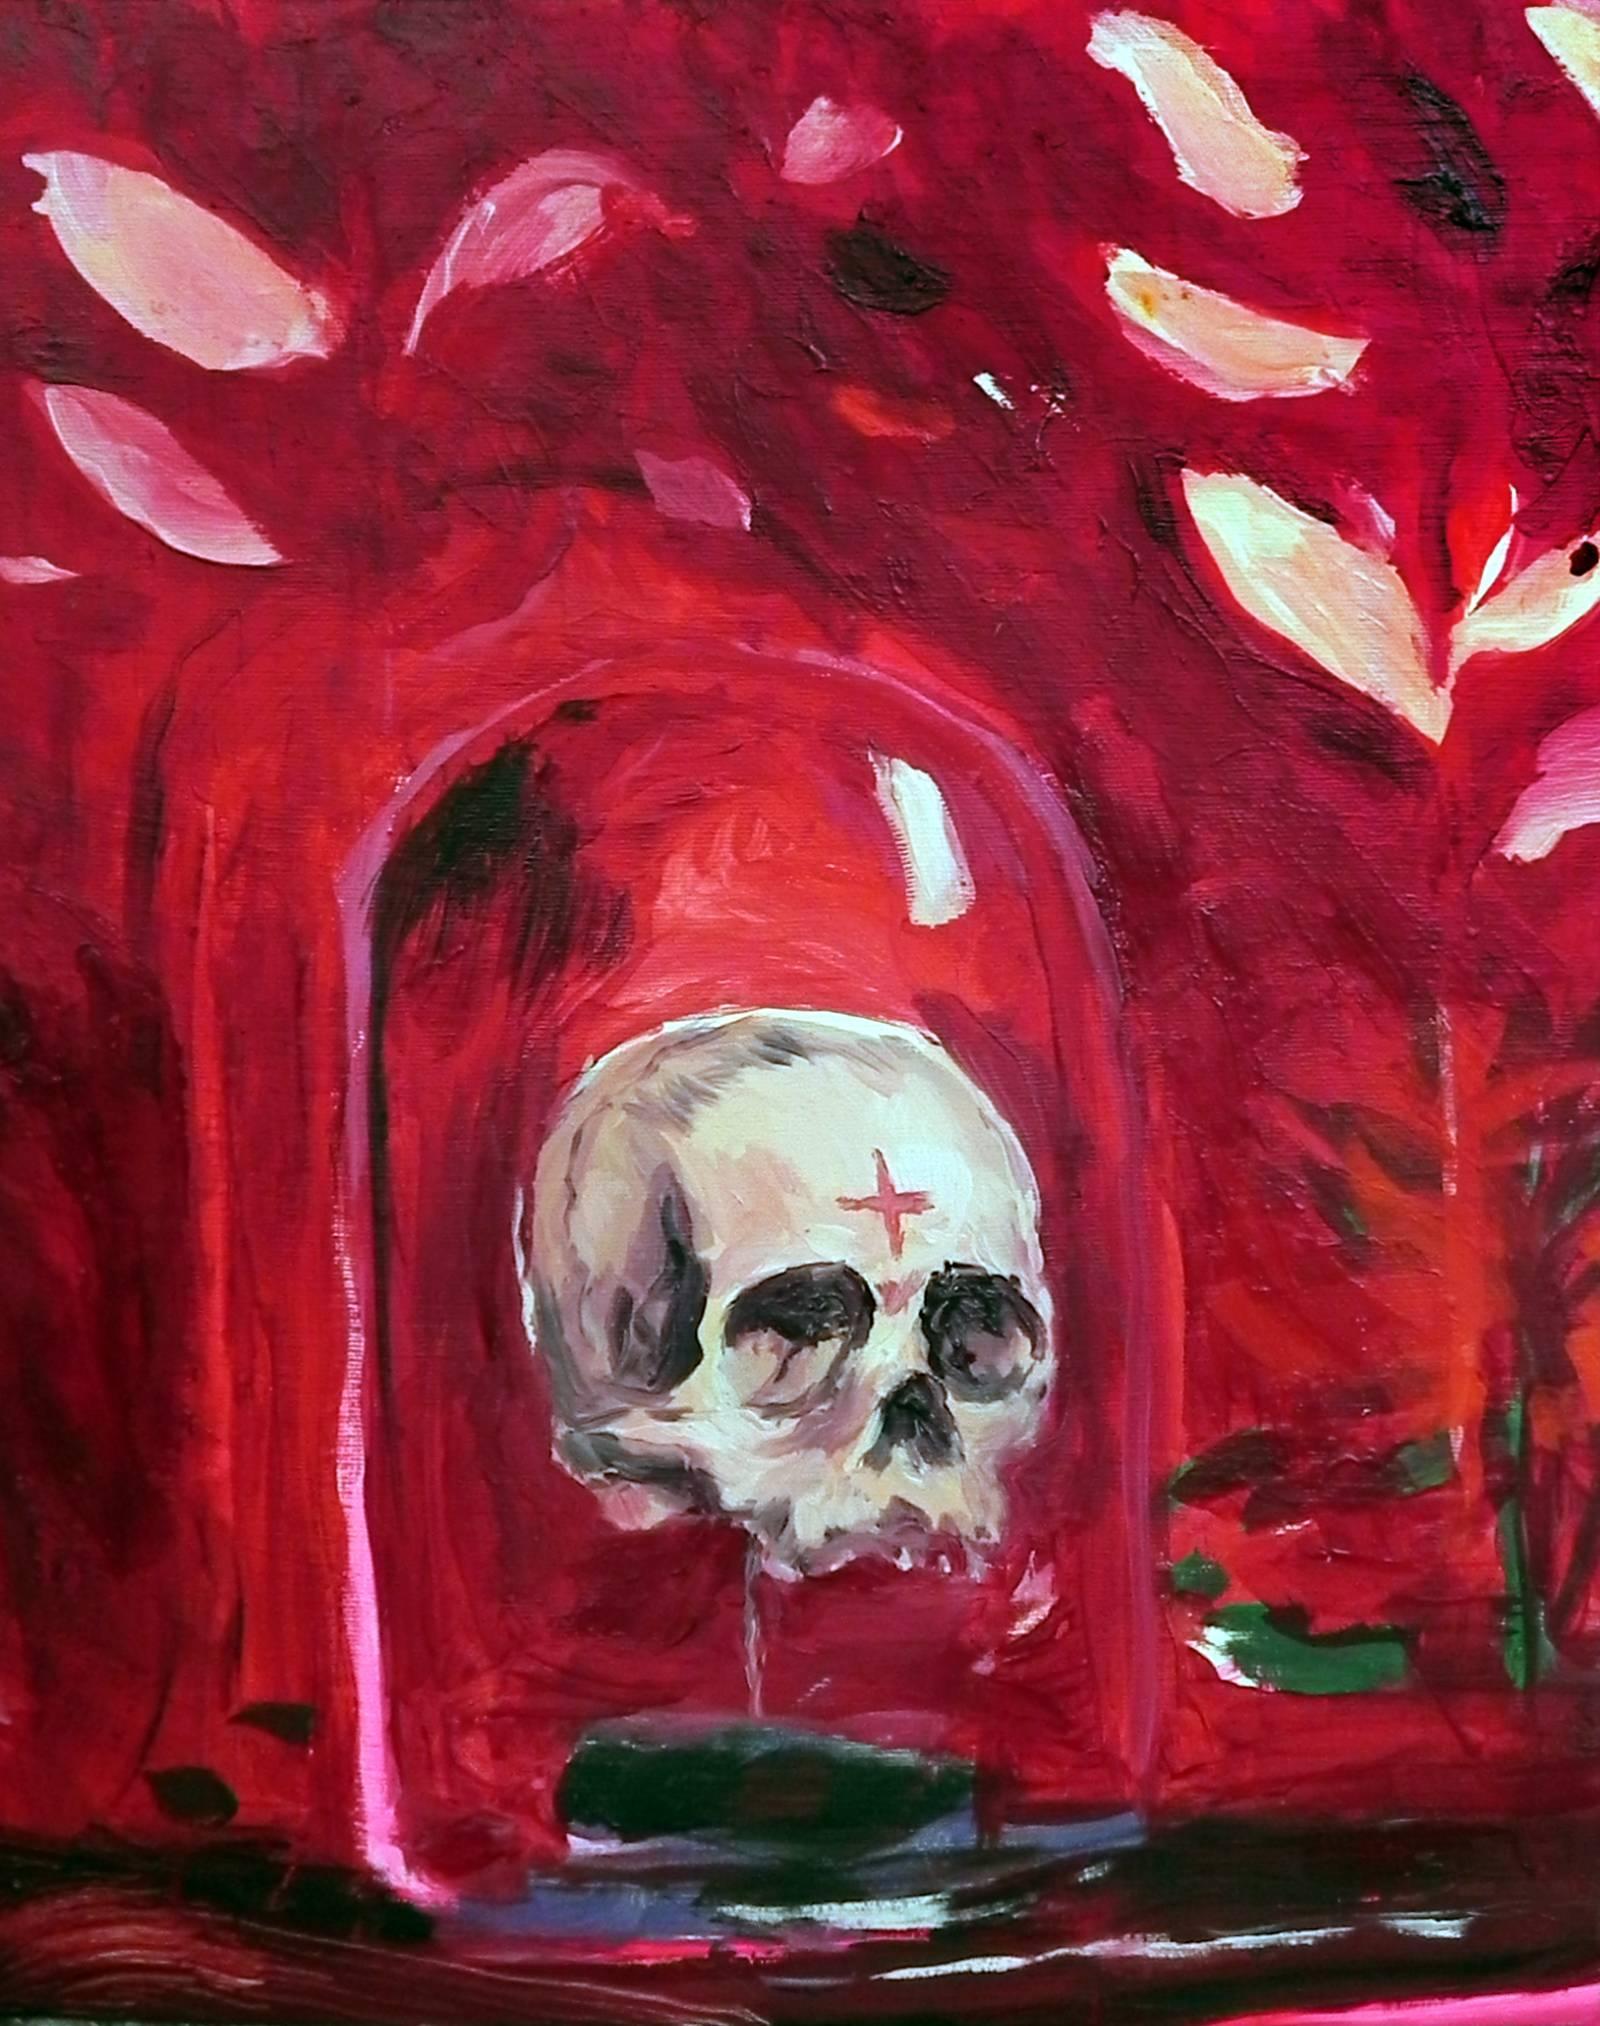 Vanitas - 21st Century, Skull, Red, Figurative Painting, Small